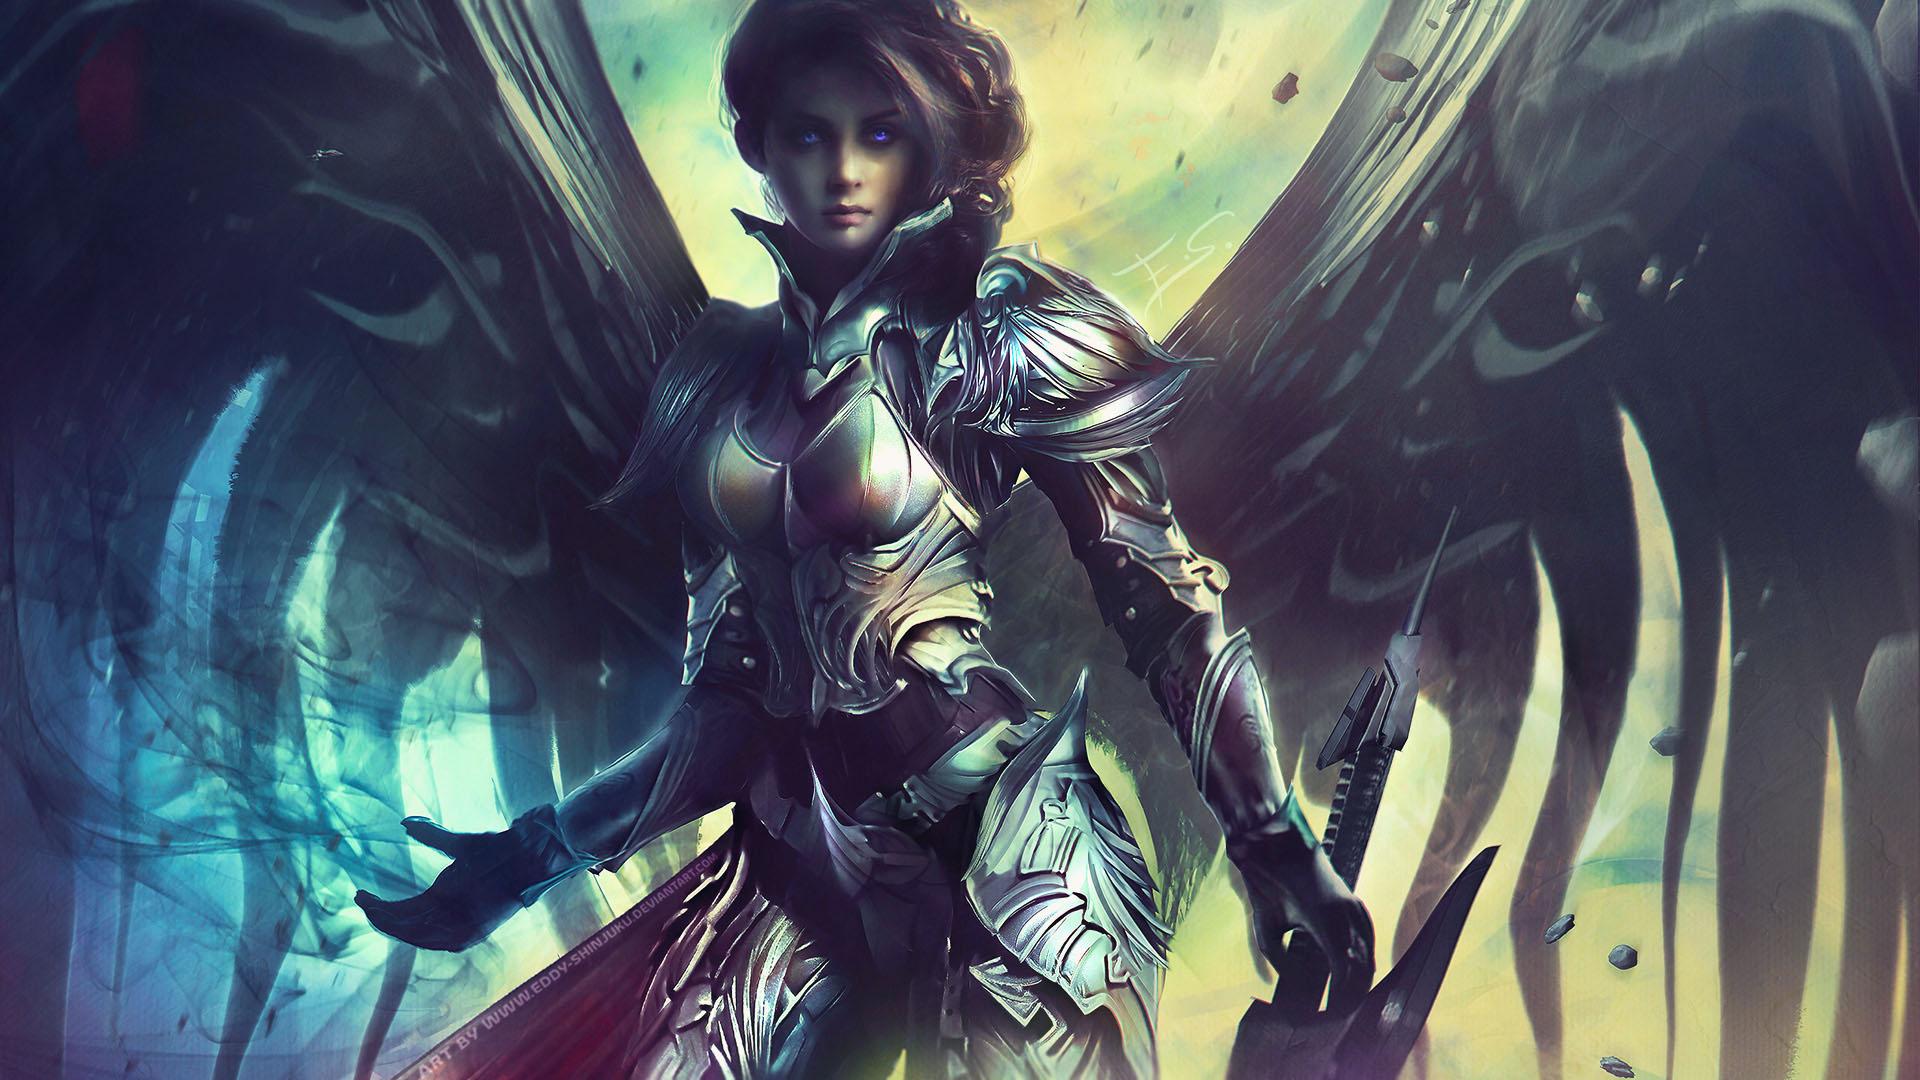 Vesudah: Archangel of the Infinite